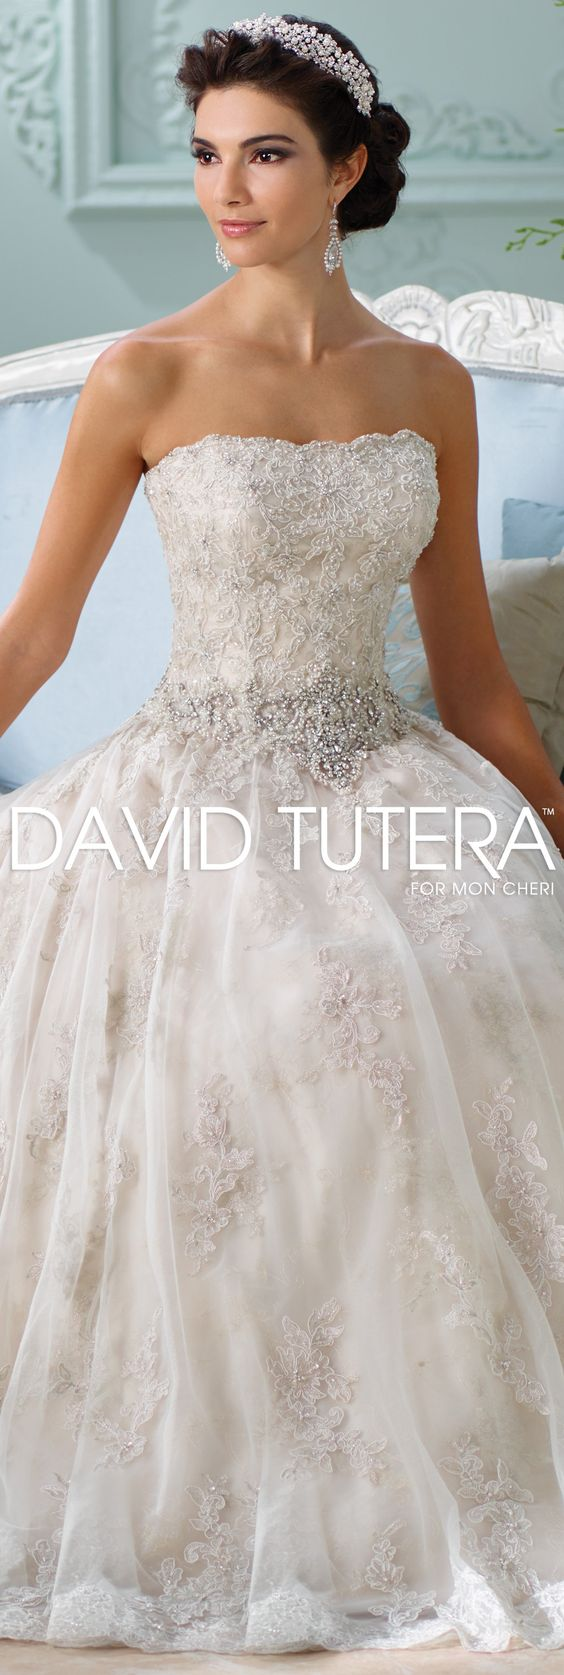 The David Tutera for Mon Cheri Spring 2016 Wedding Gown Collection - Style No. 116230 Jelena #laceandtulleweddingdress